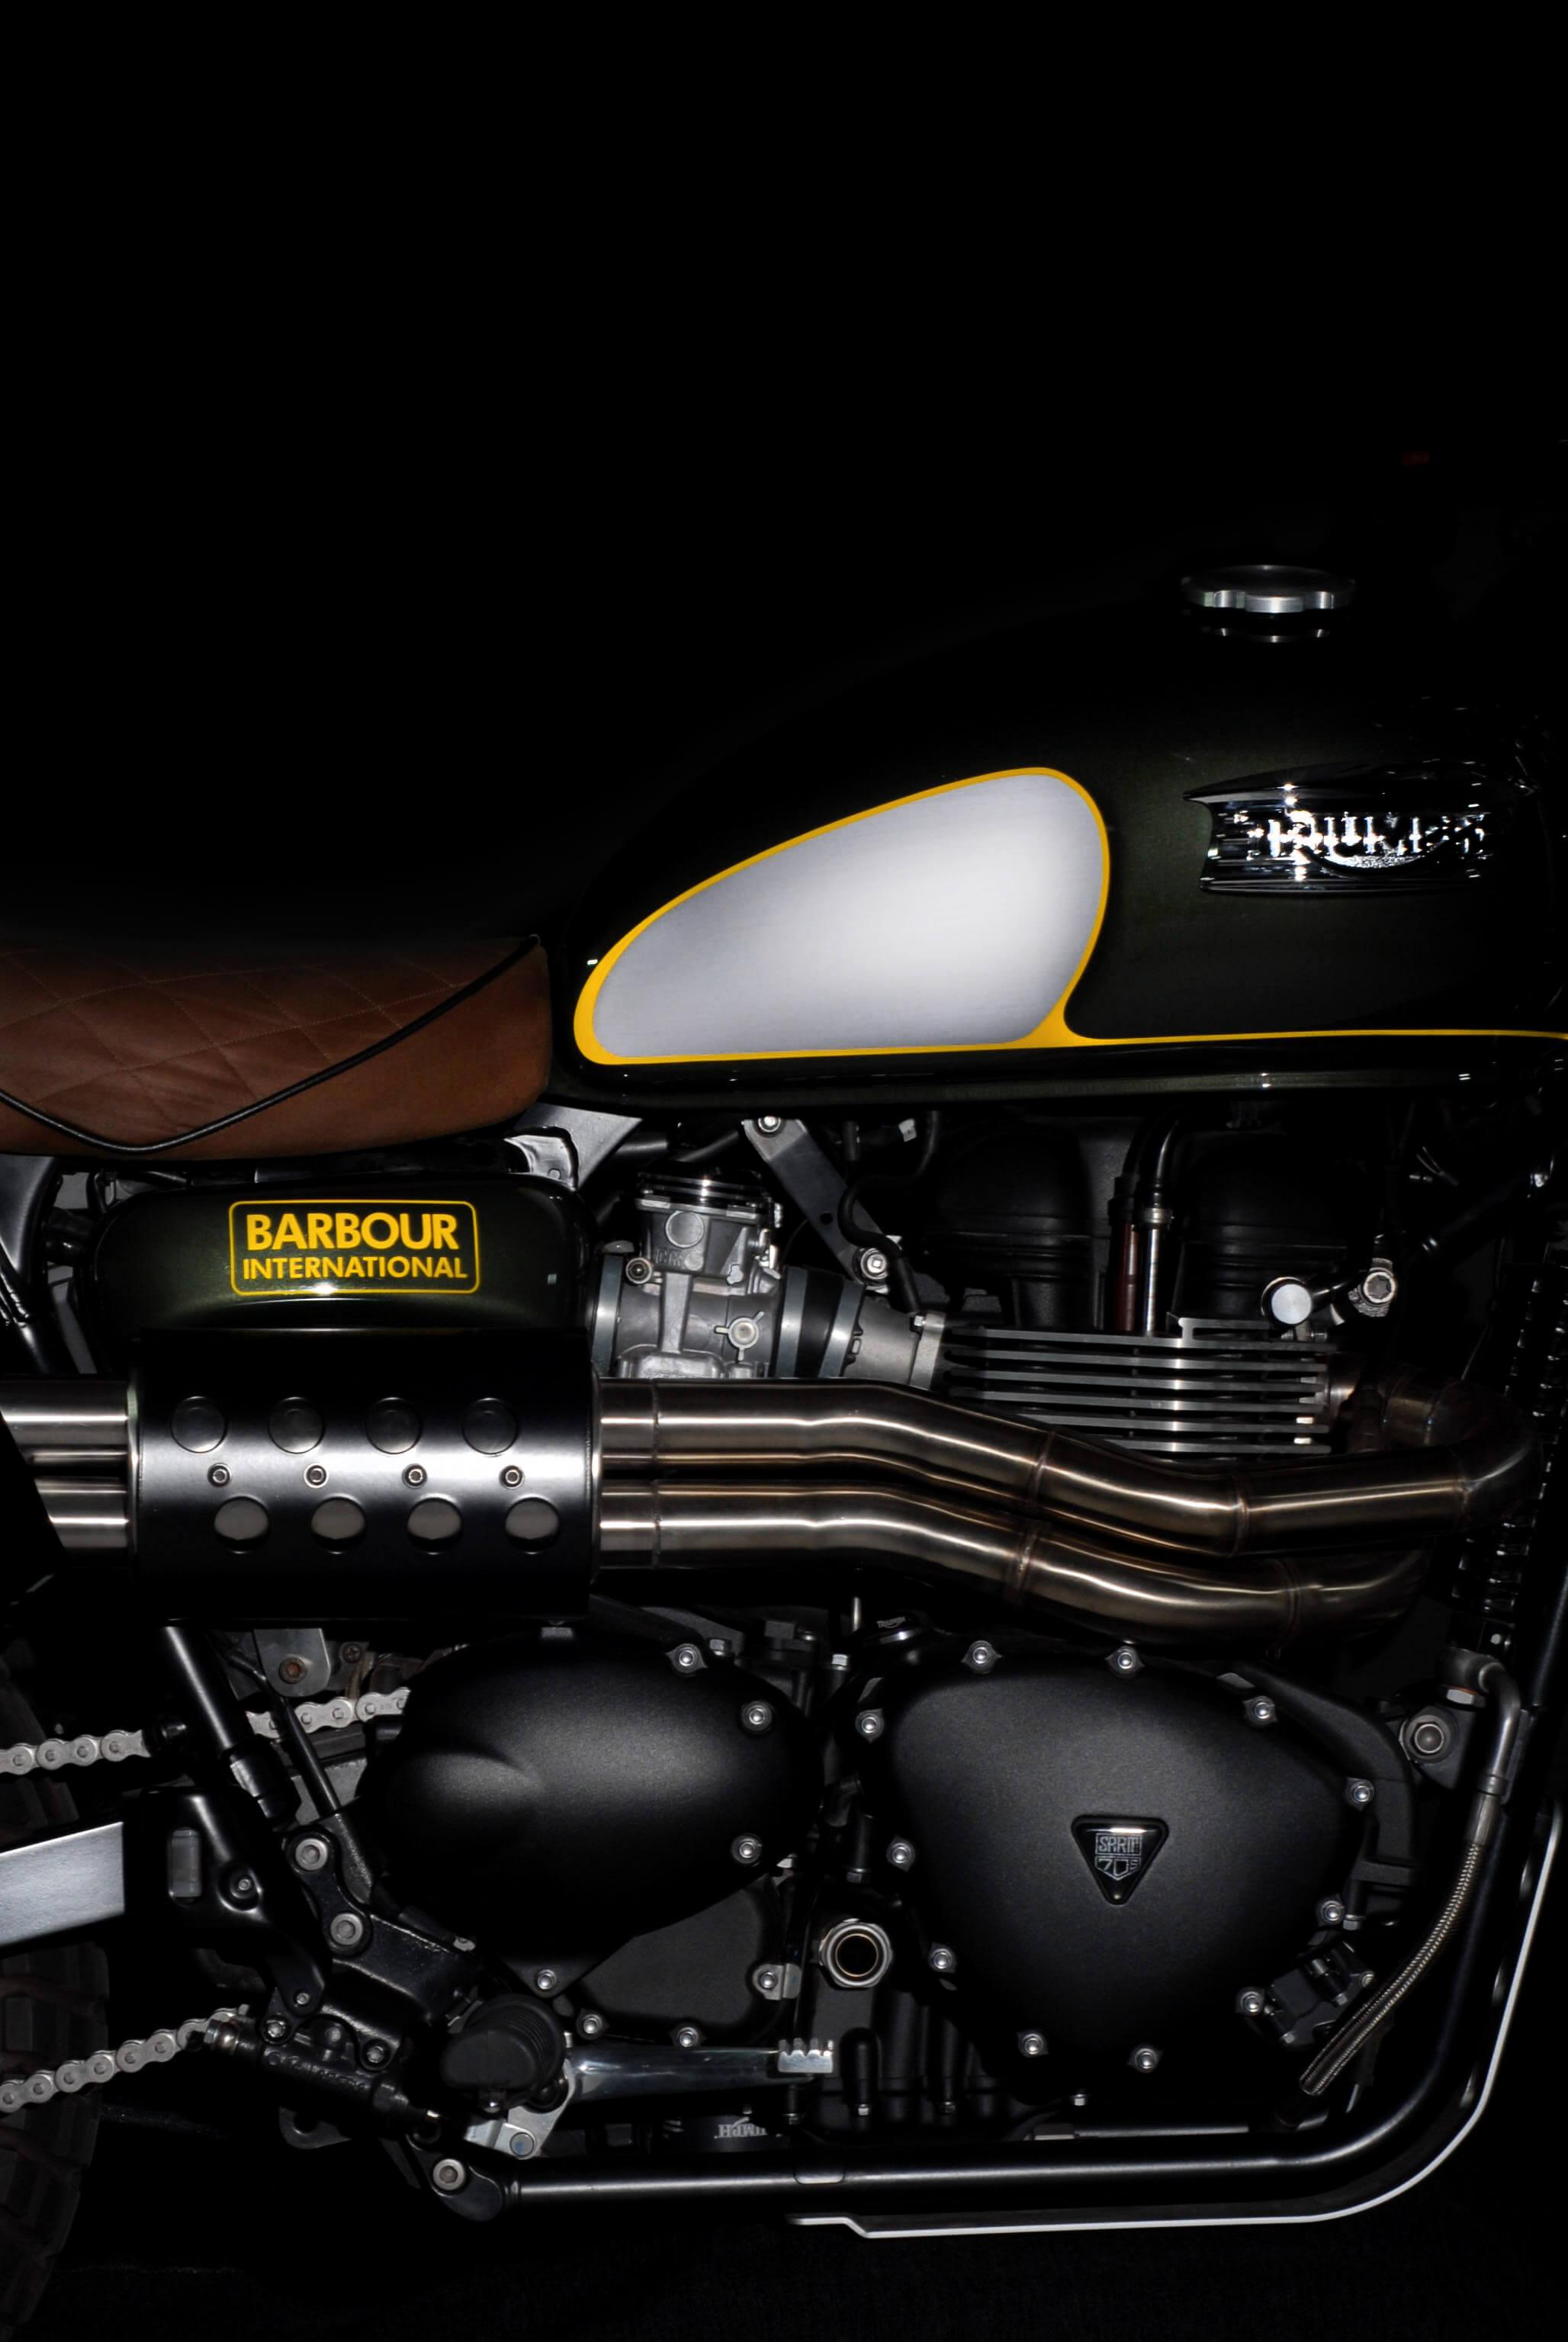 A225, Scrambler, Barbour, Barbour International, Britain, British, Photography, Film, WeAreShuffle, Biker, Motorcycle, Triumph